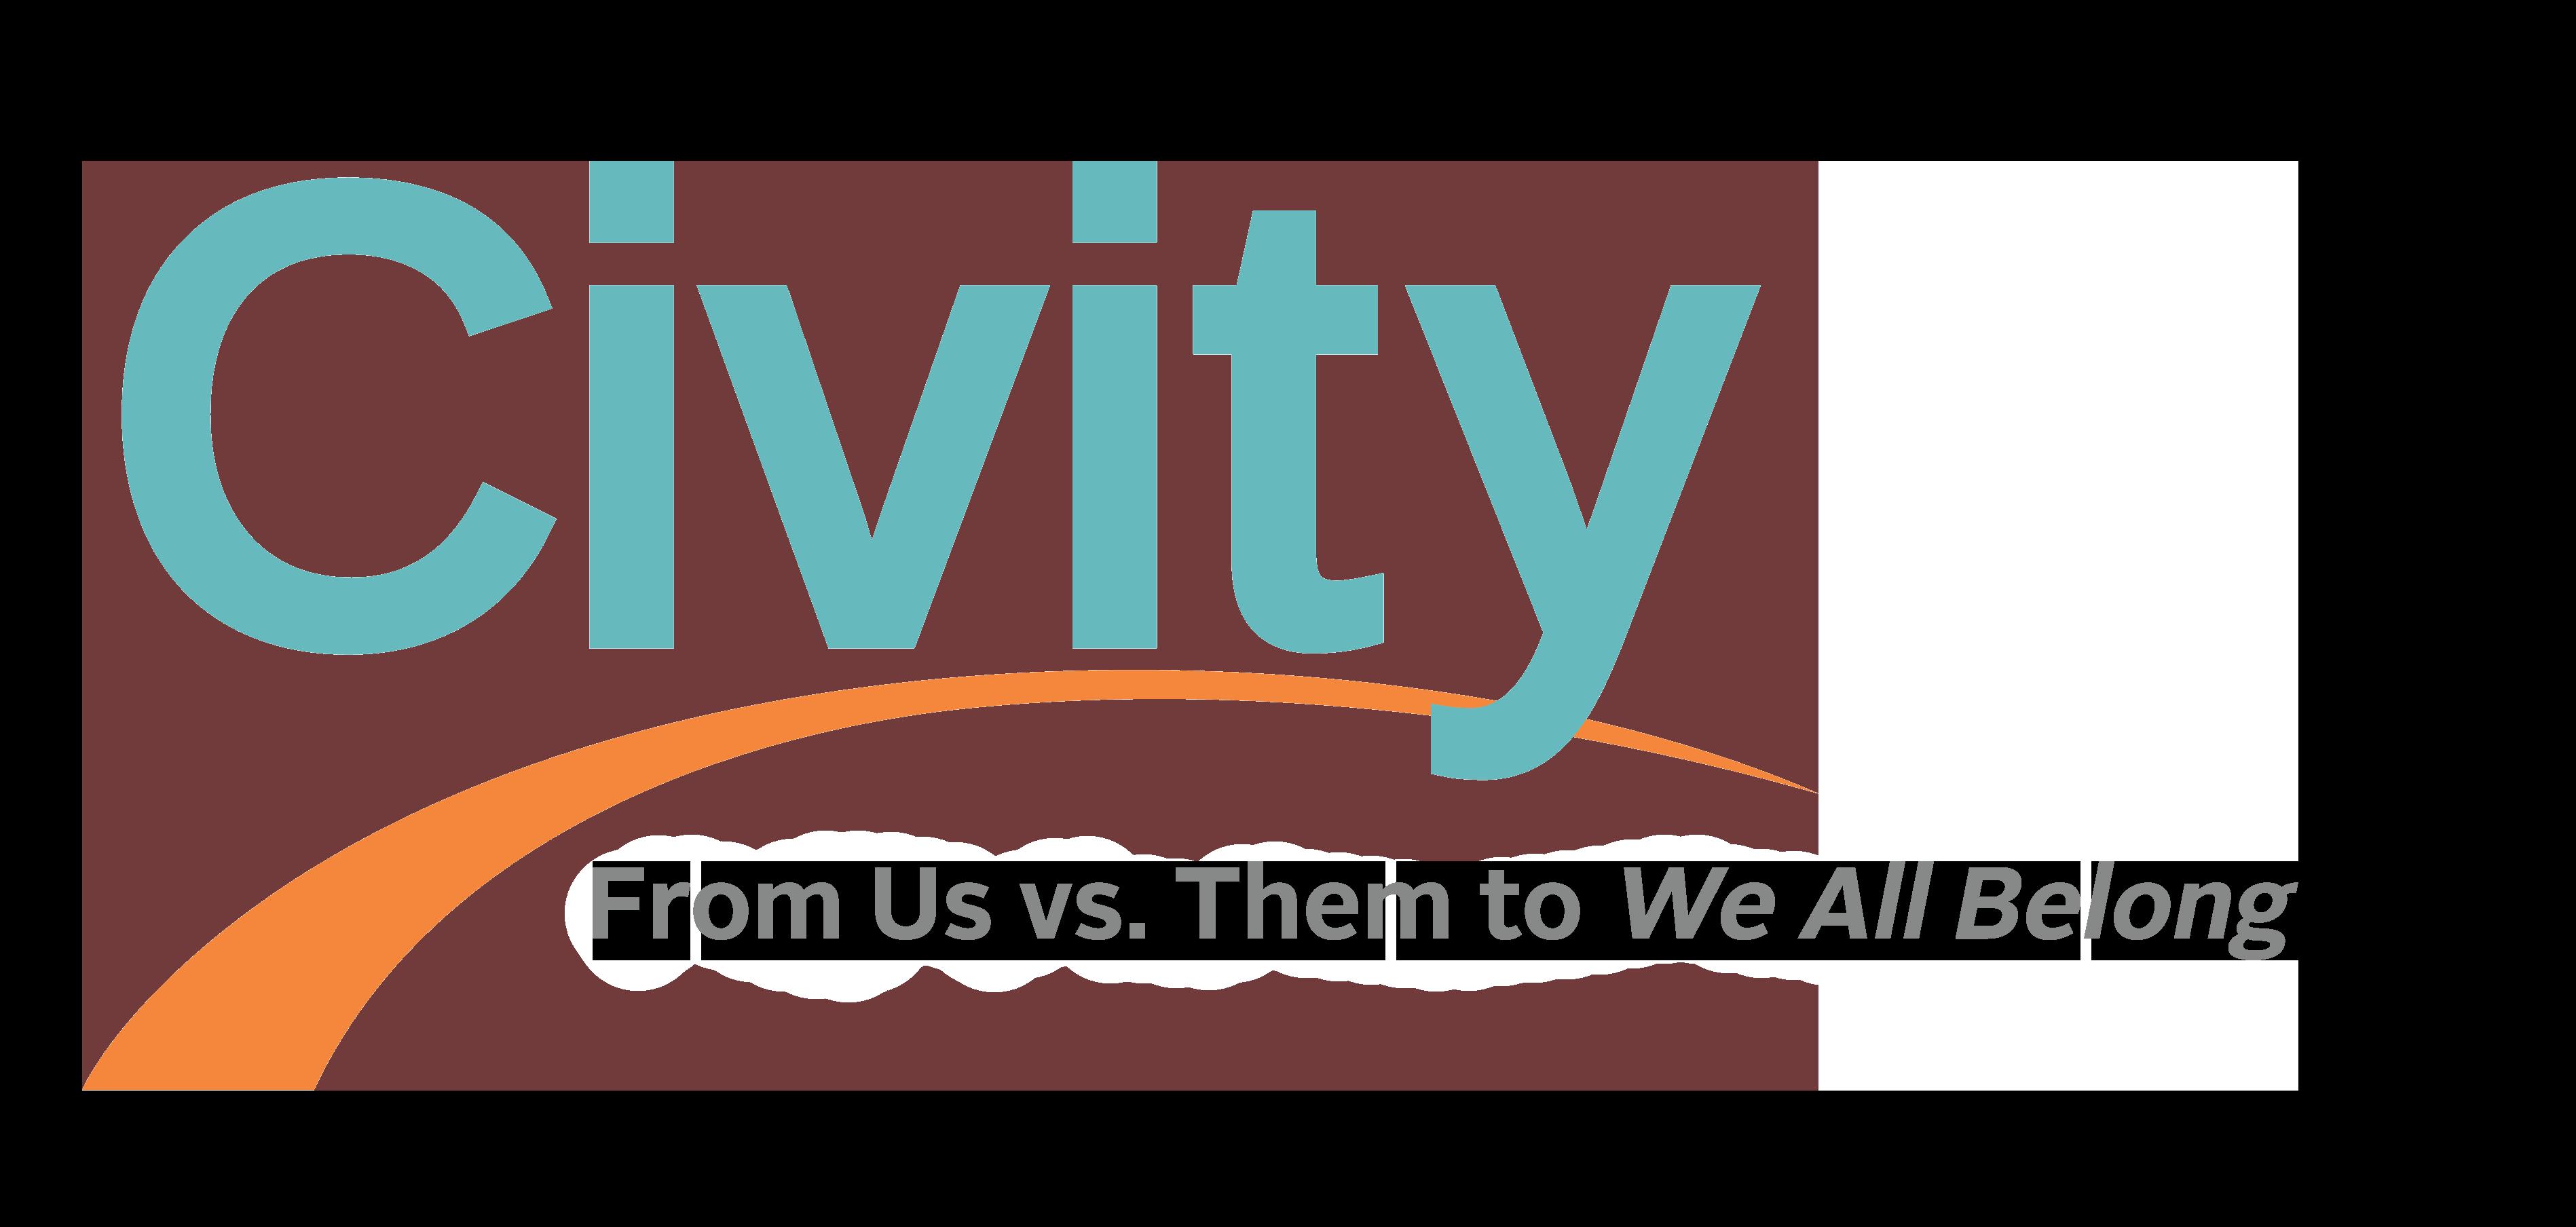 Civity Logo 2021 Gina Baleria